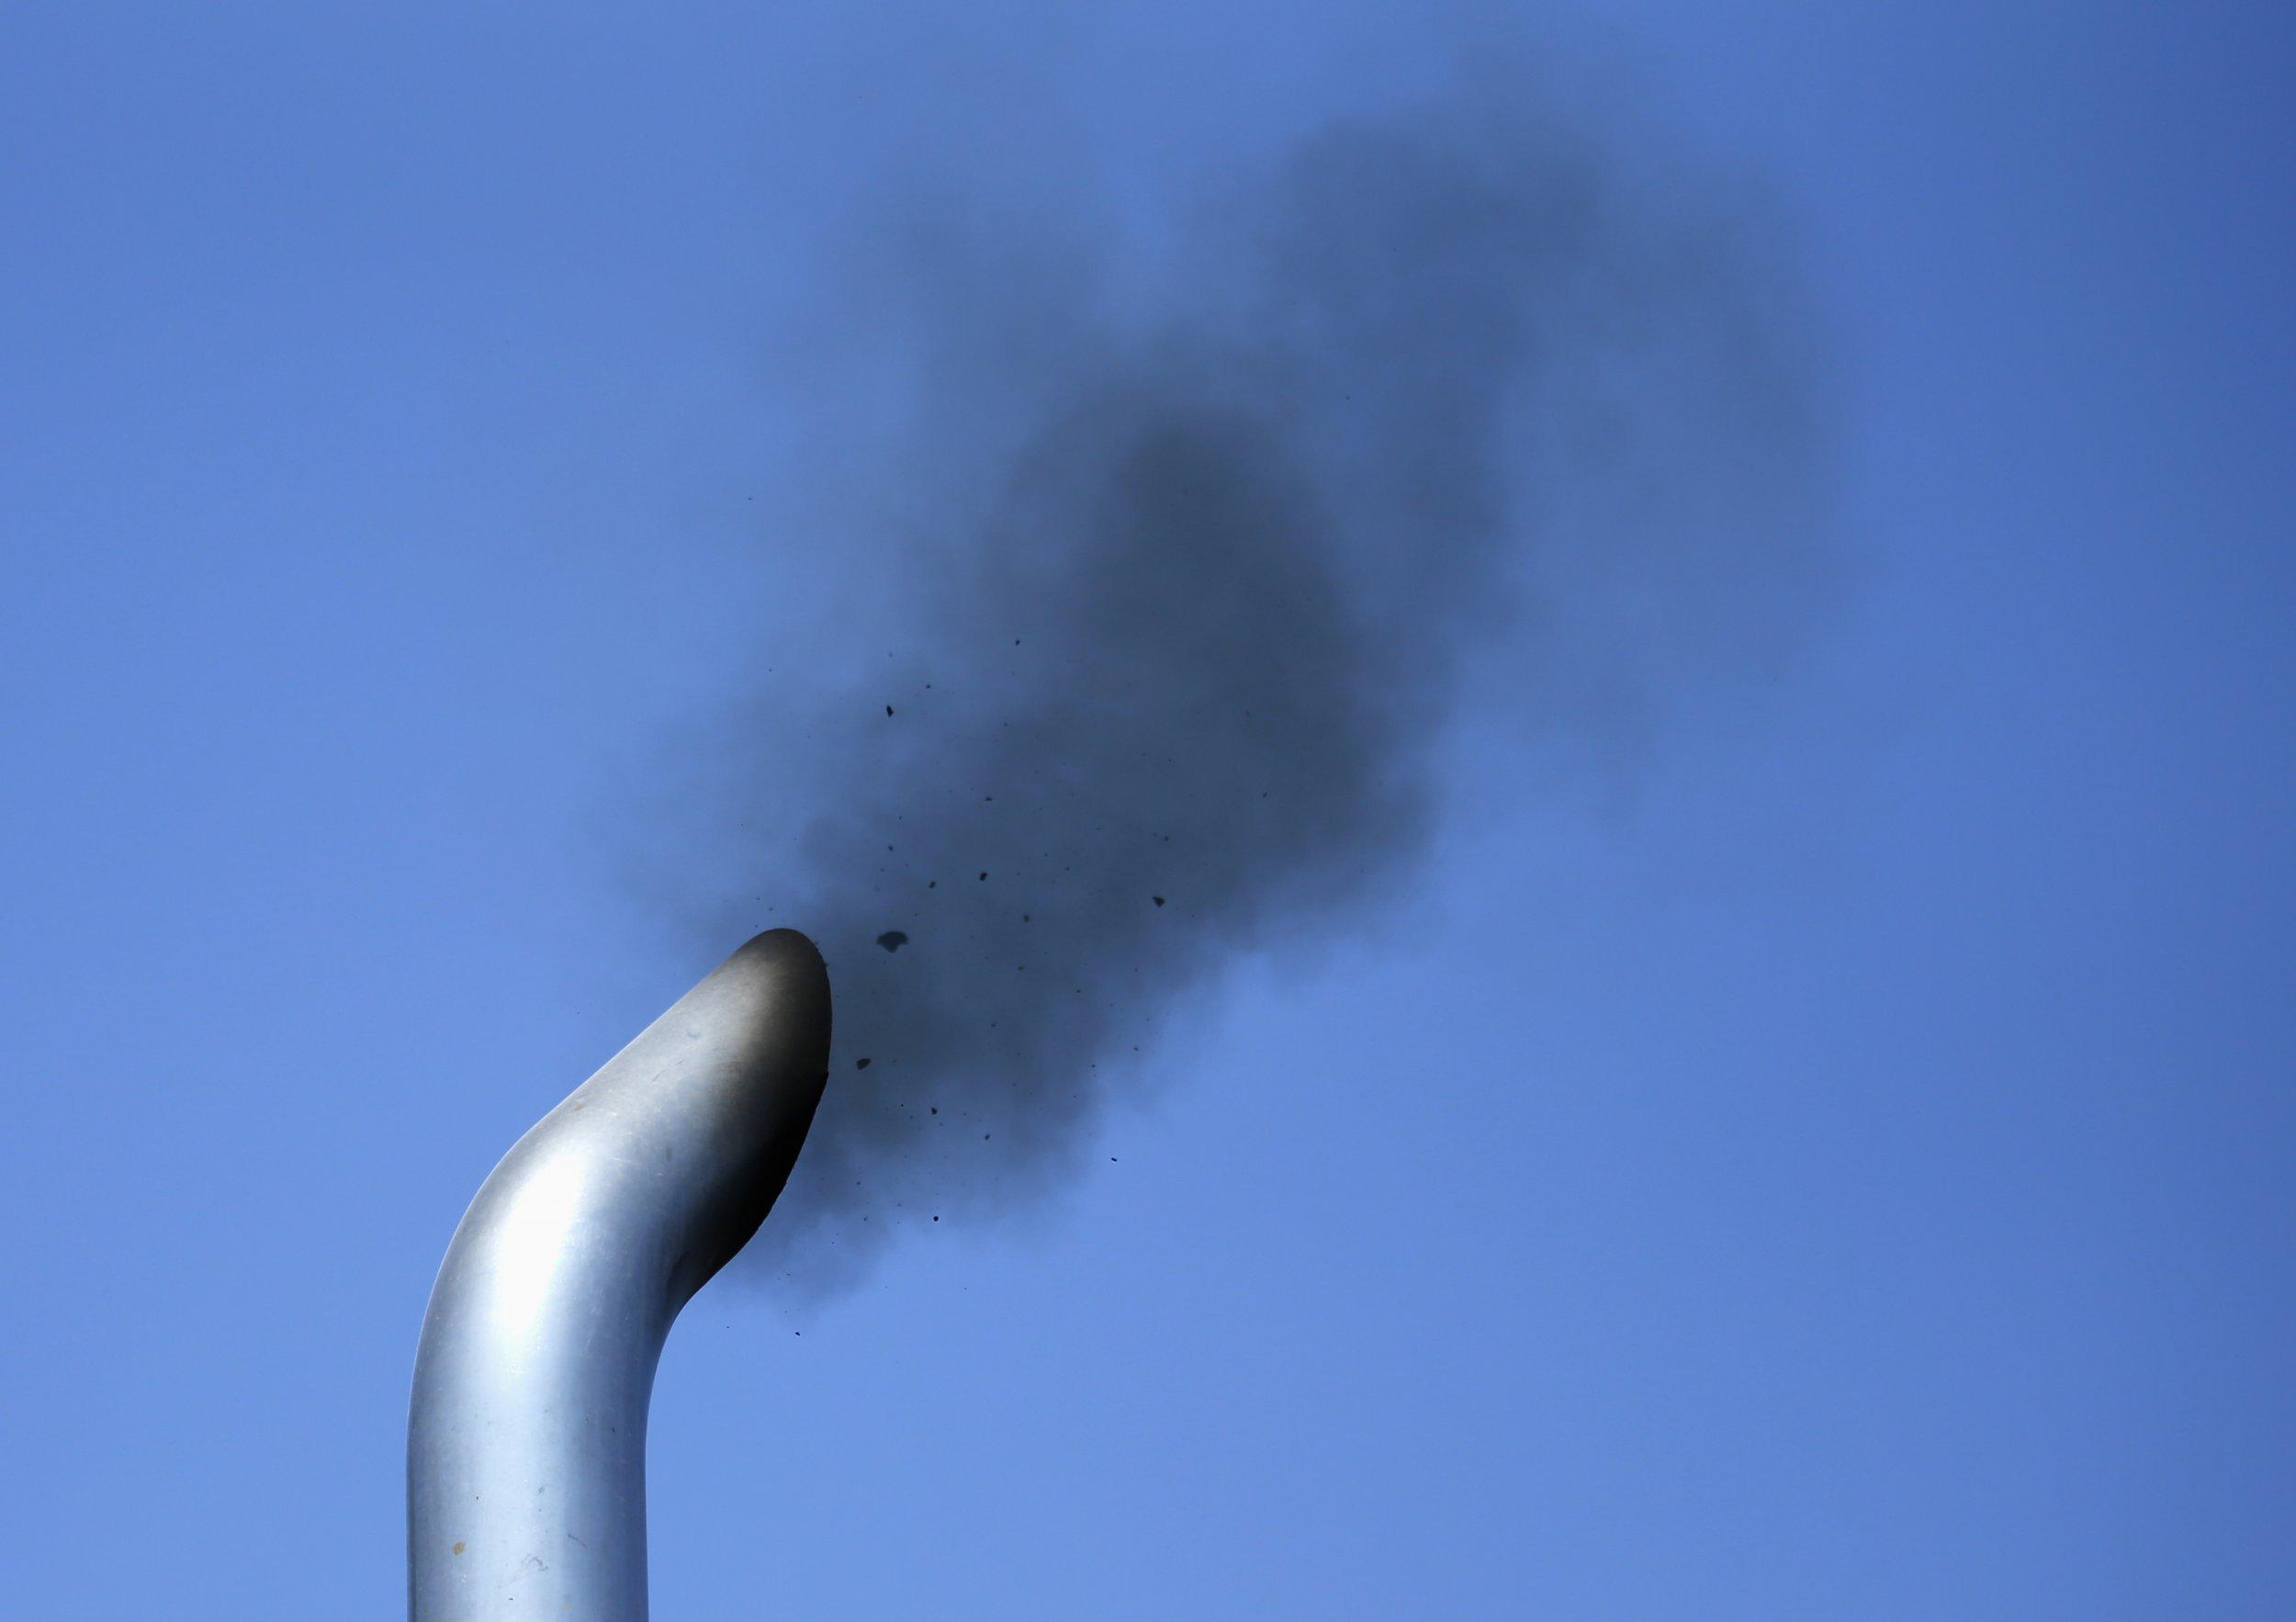 09_16_15_Air Pollution Early Death Heart Disease